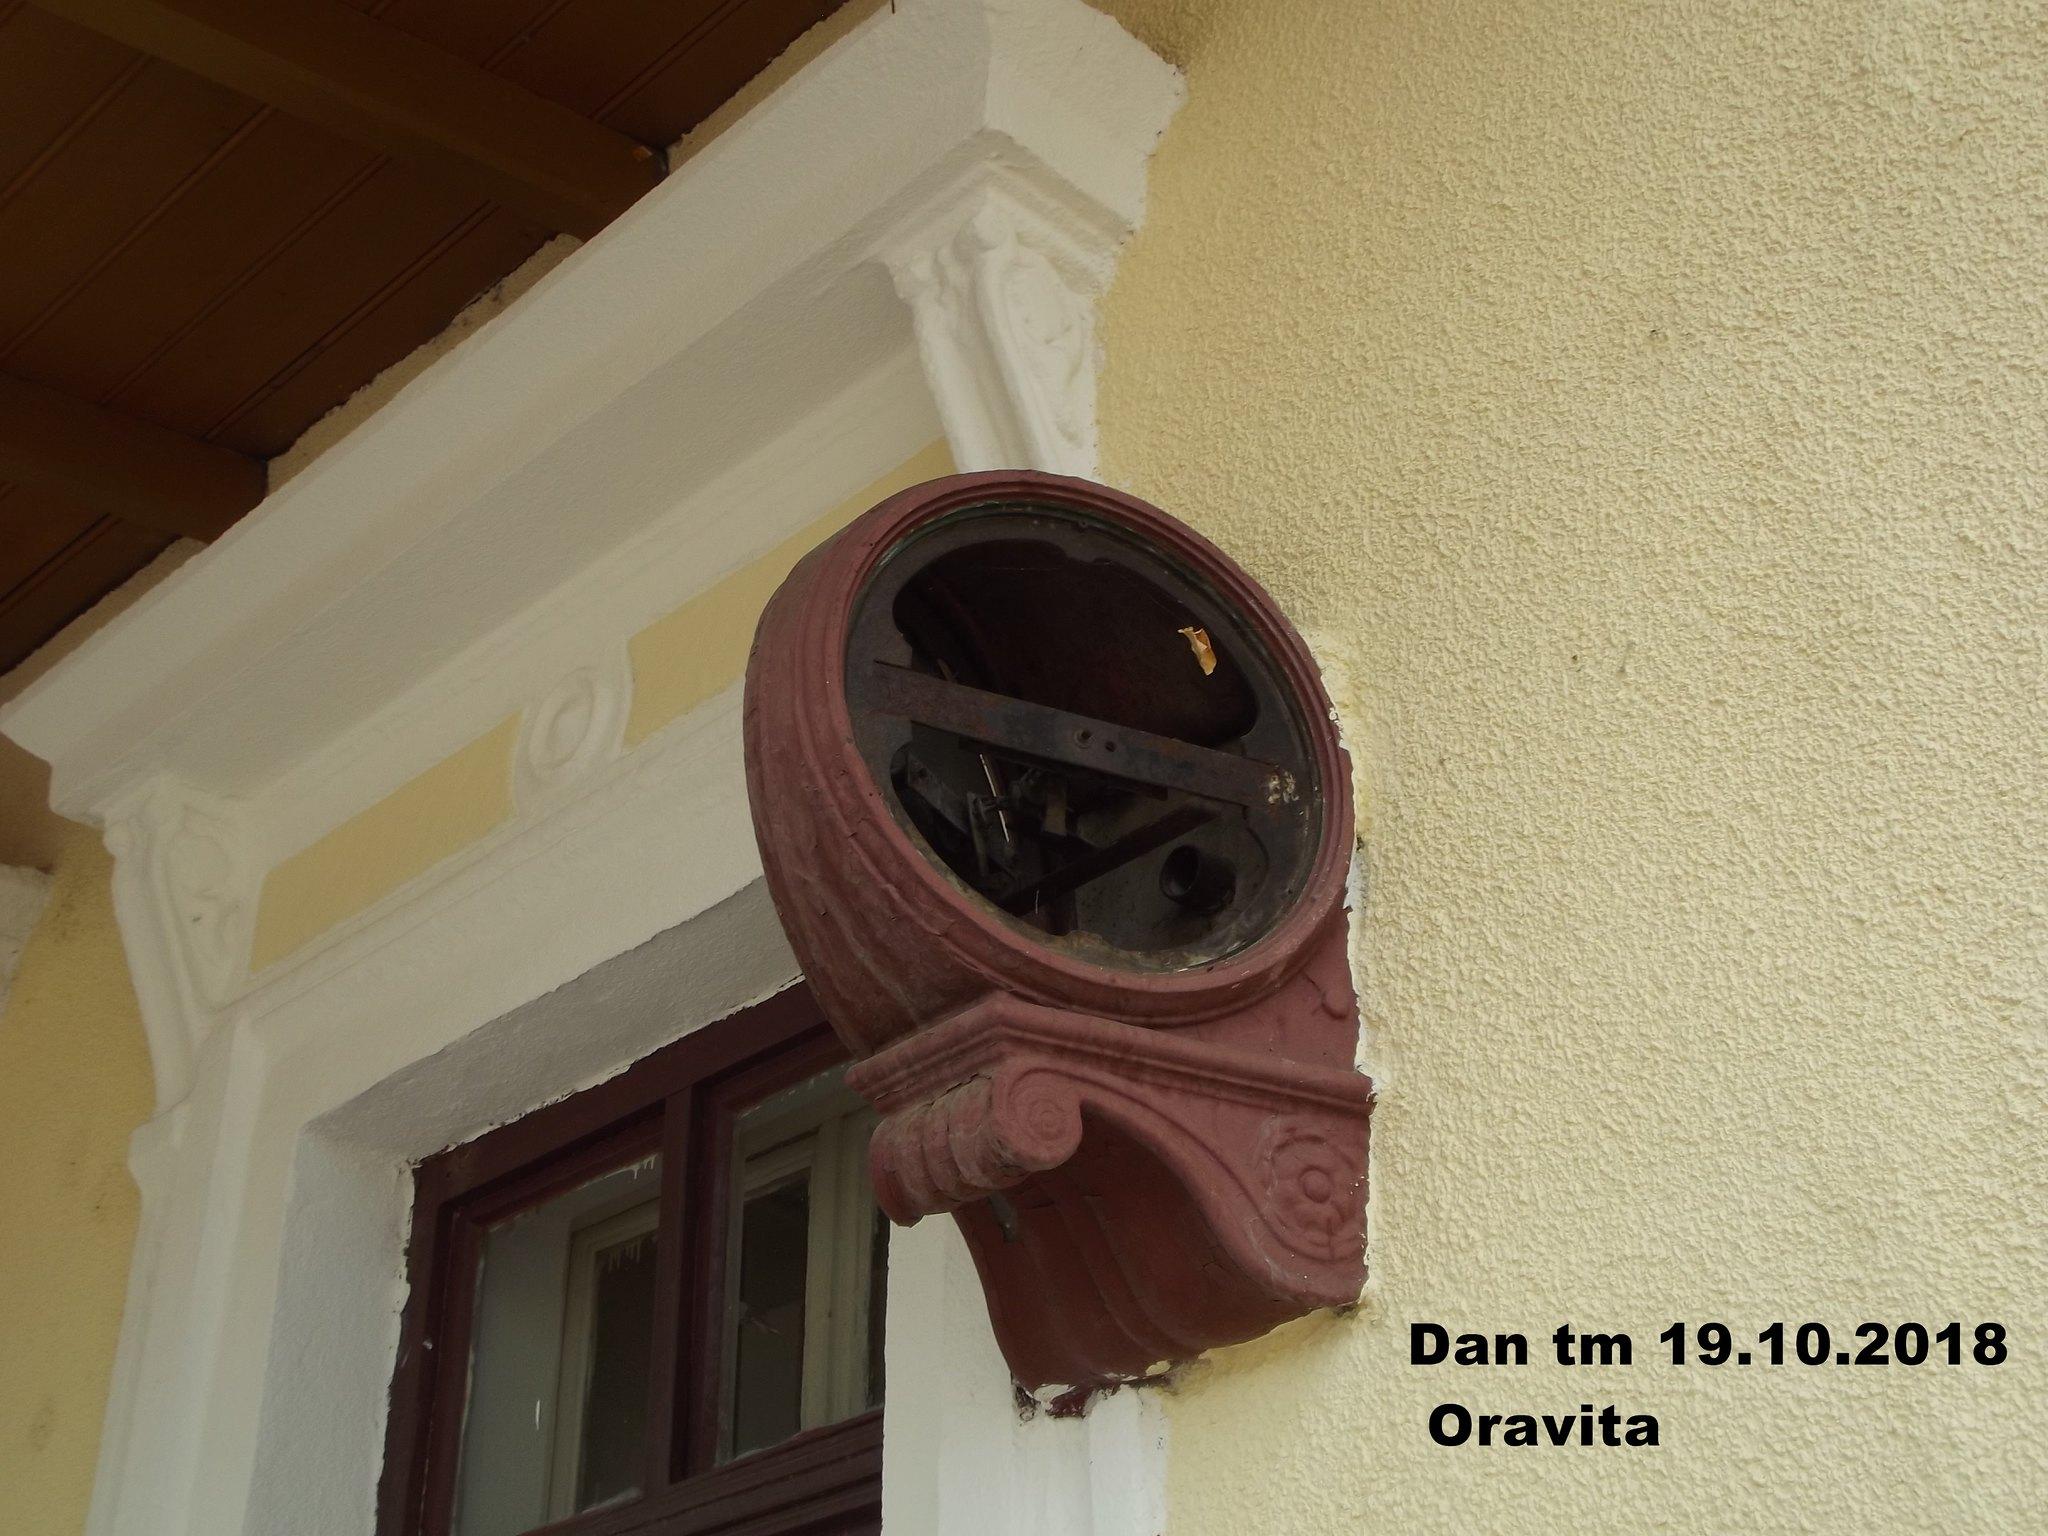 925 : Oravita - Anina - Pagina 40 44556922885_683c001119_k